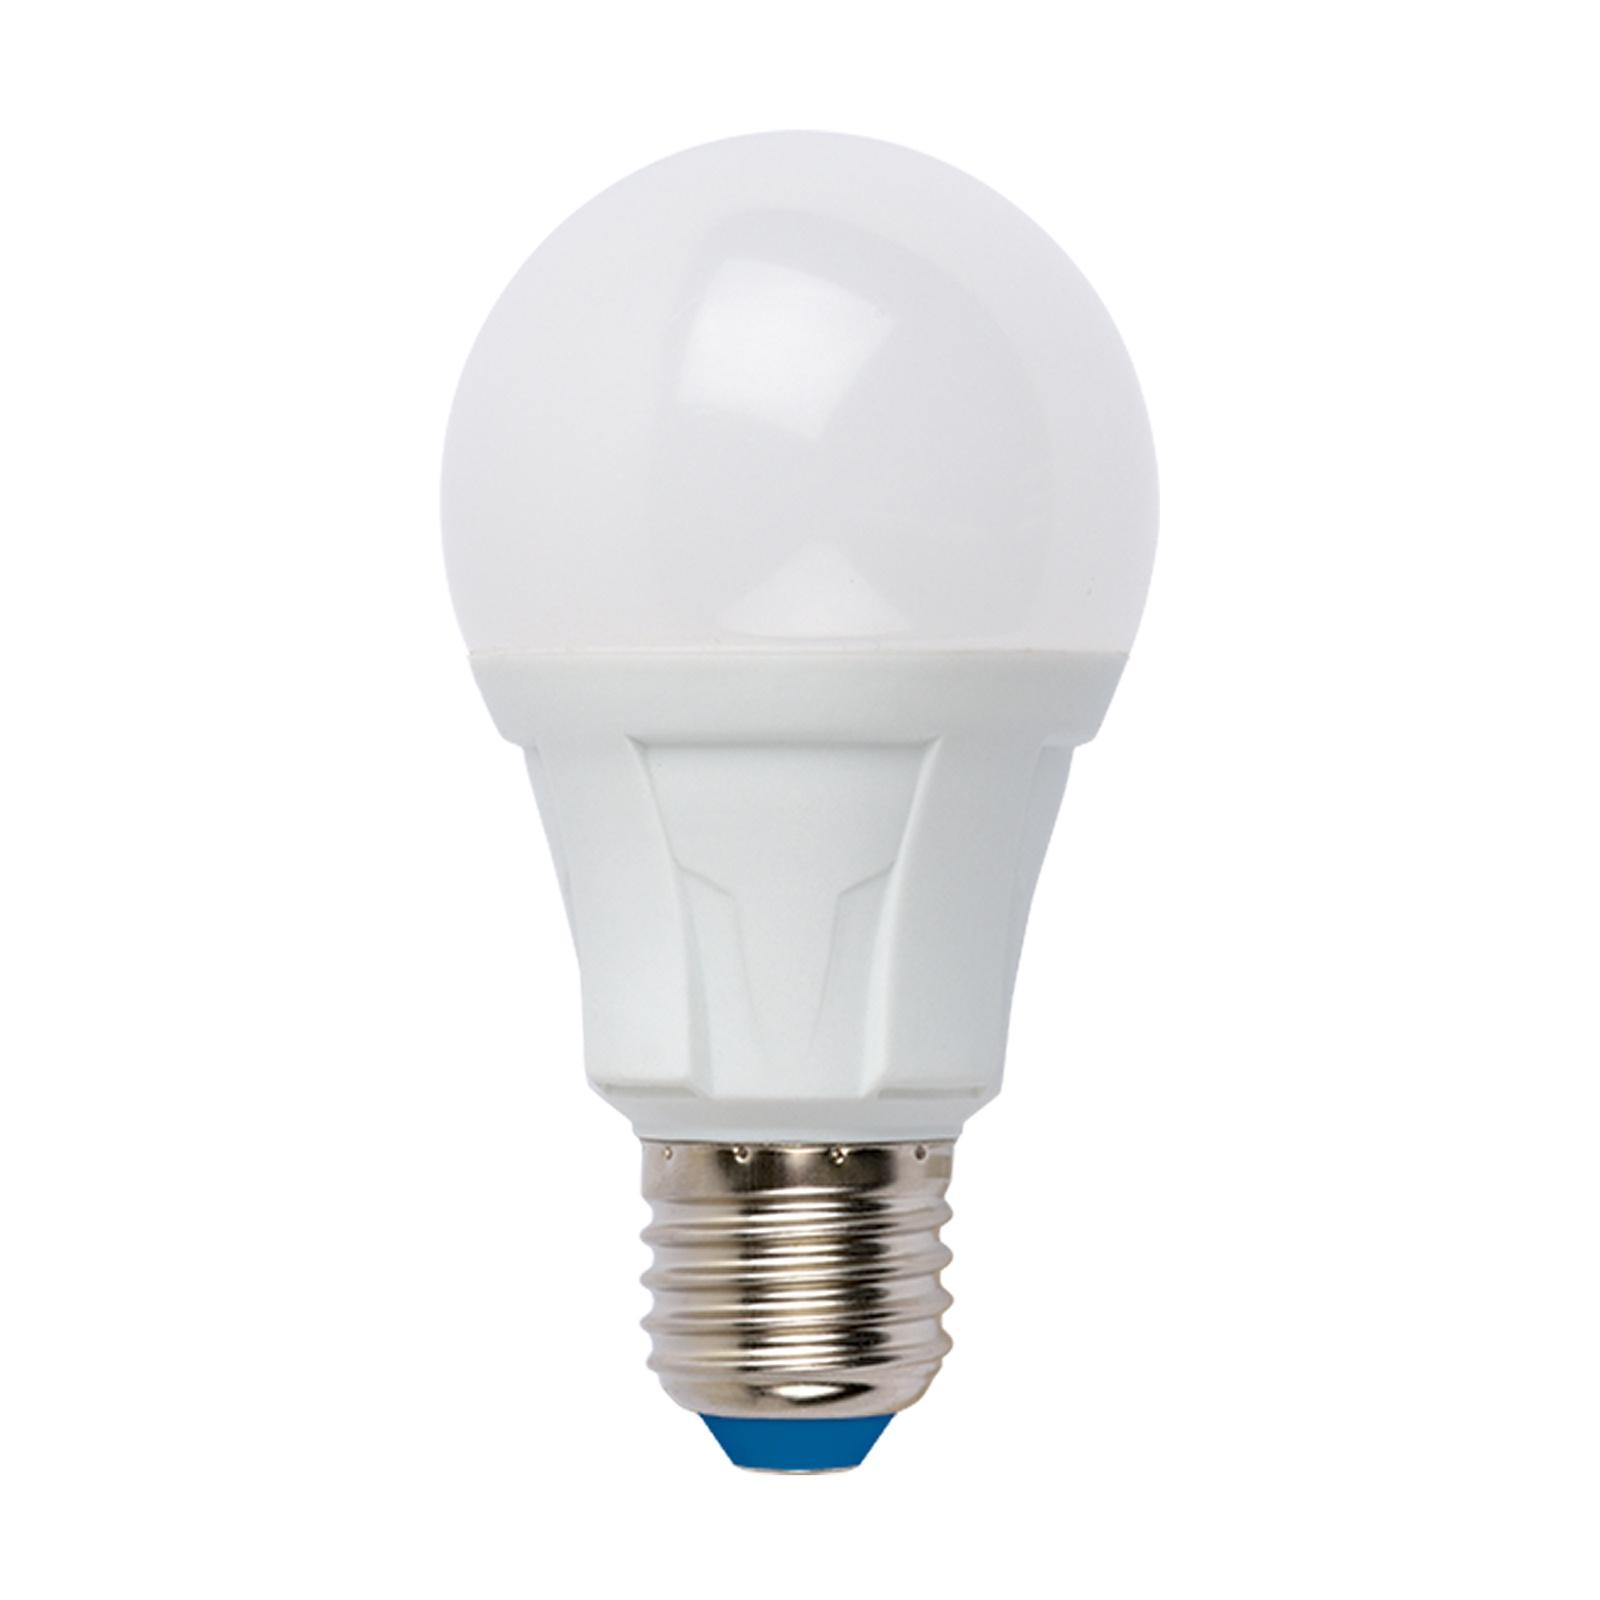 Лампочка Uniel LED-A60 8W/WW/E27/FR 3000K, Теплый свет 8 Вт, Светодиодная